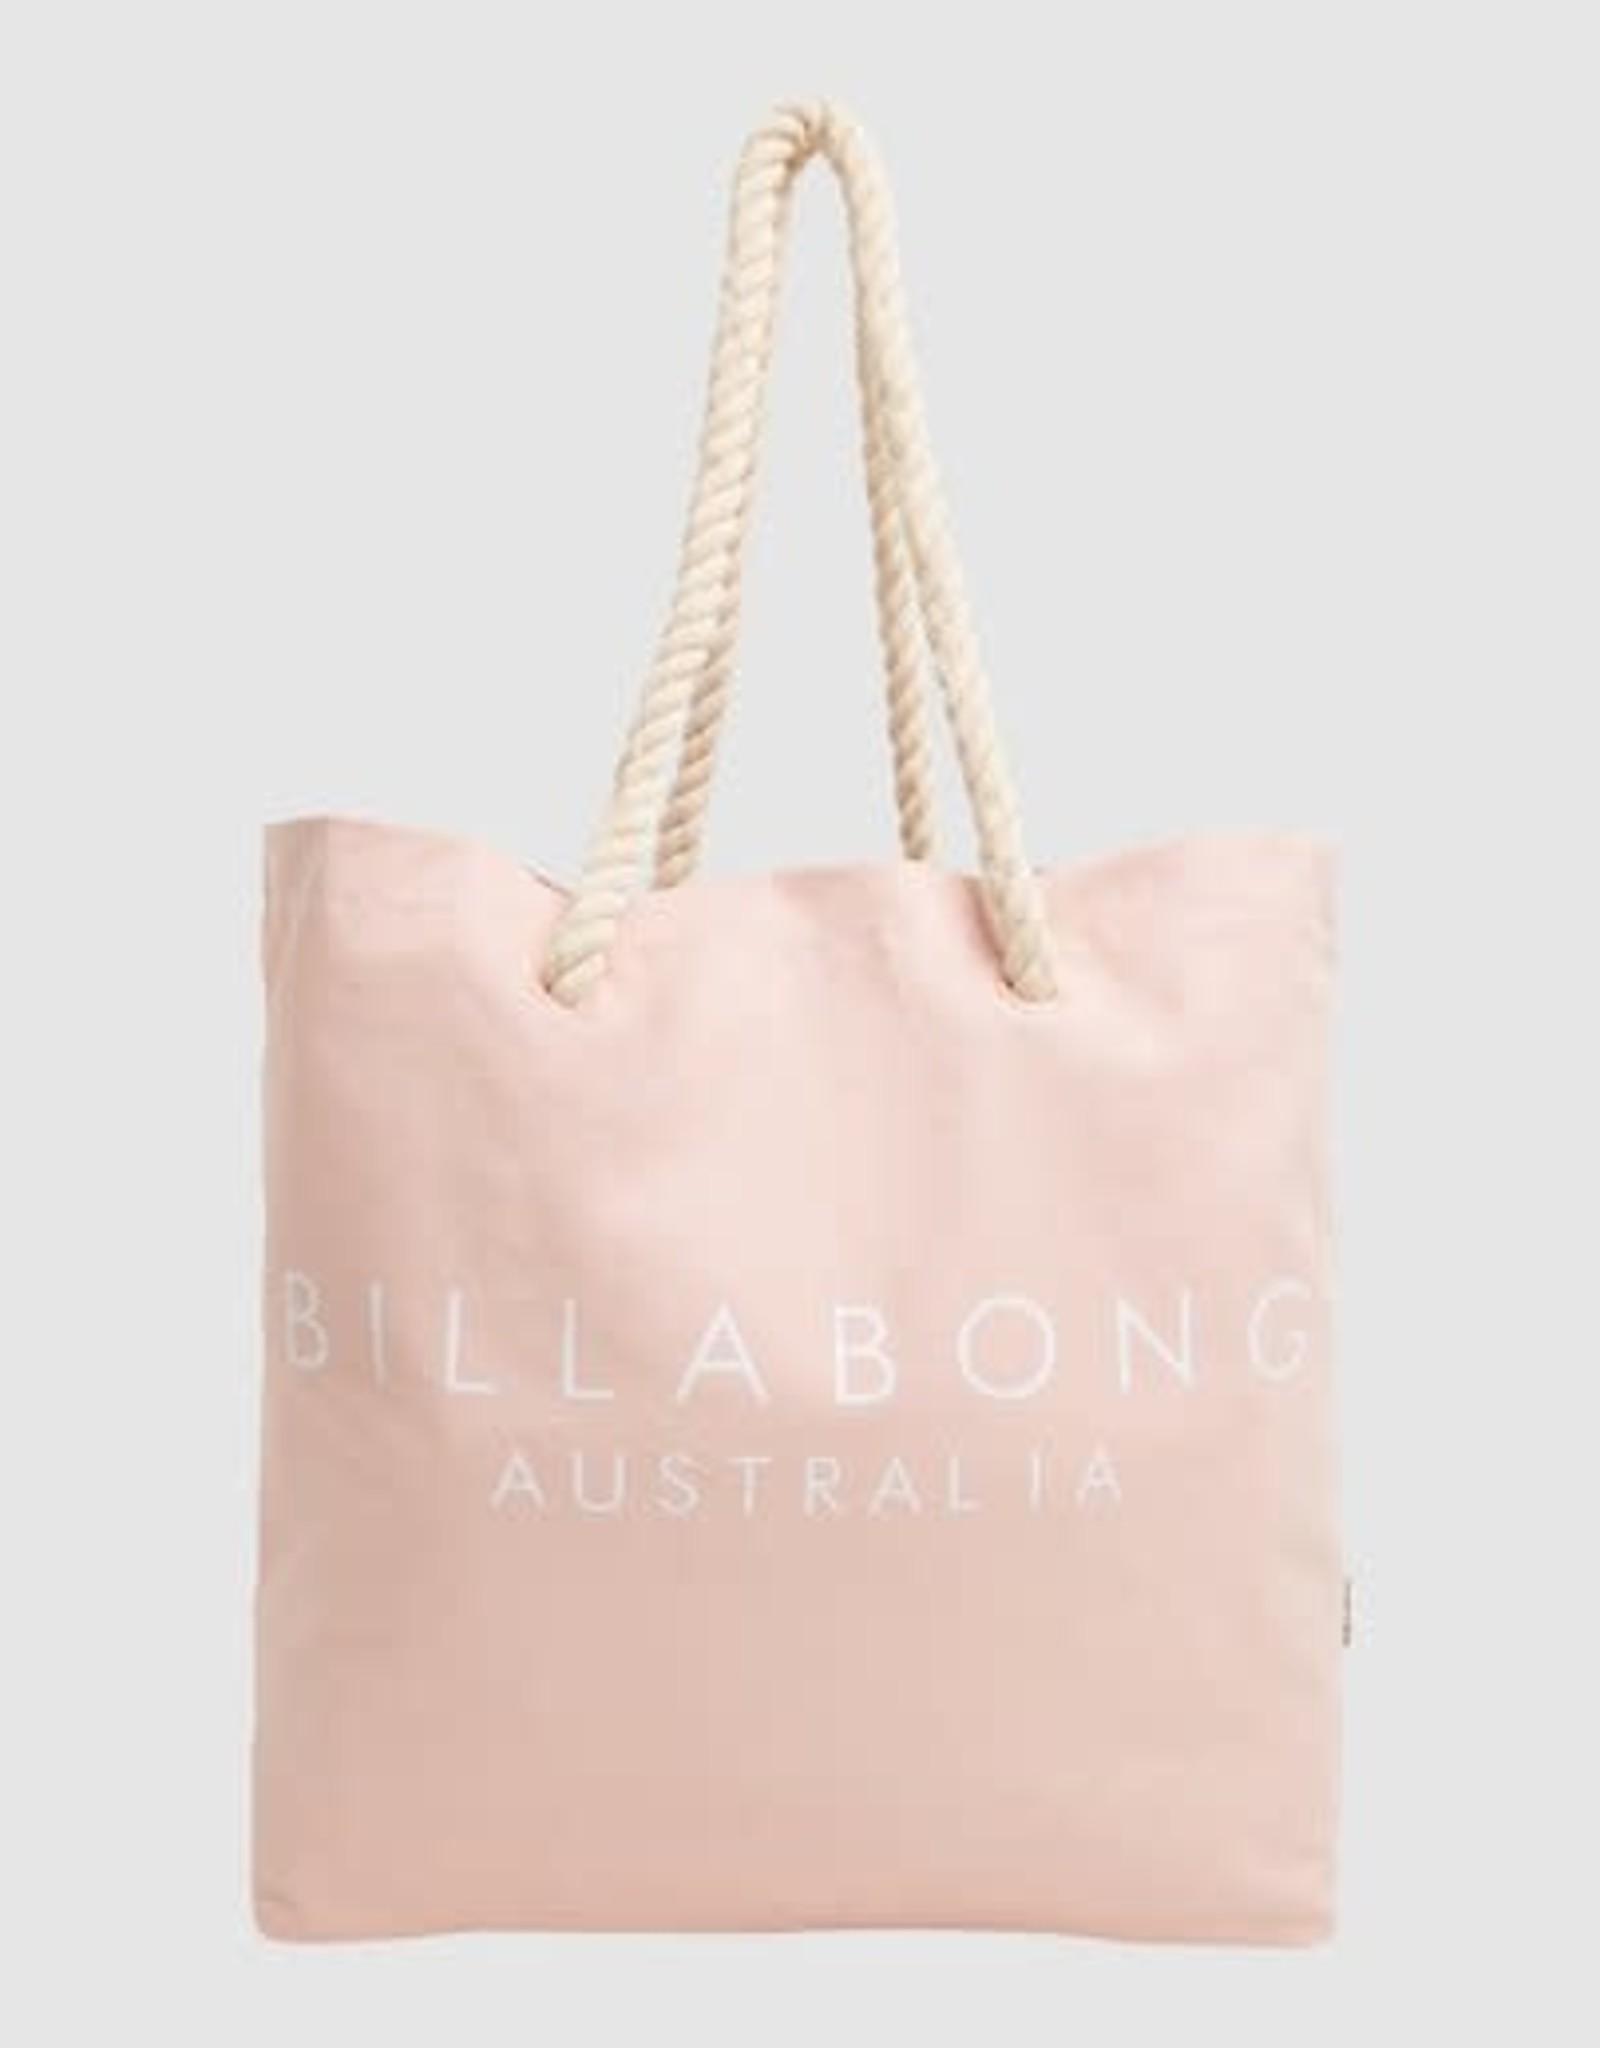 BILLABONG Serenity Beach Bag - Lotus